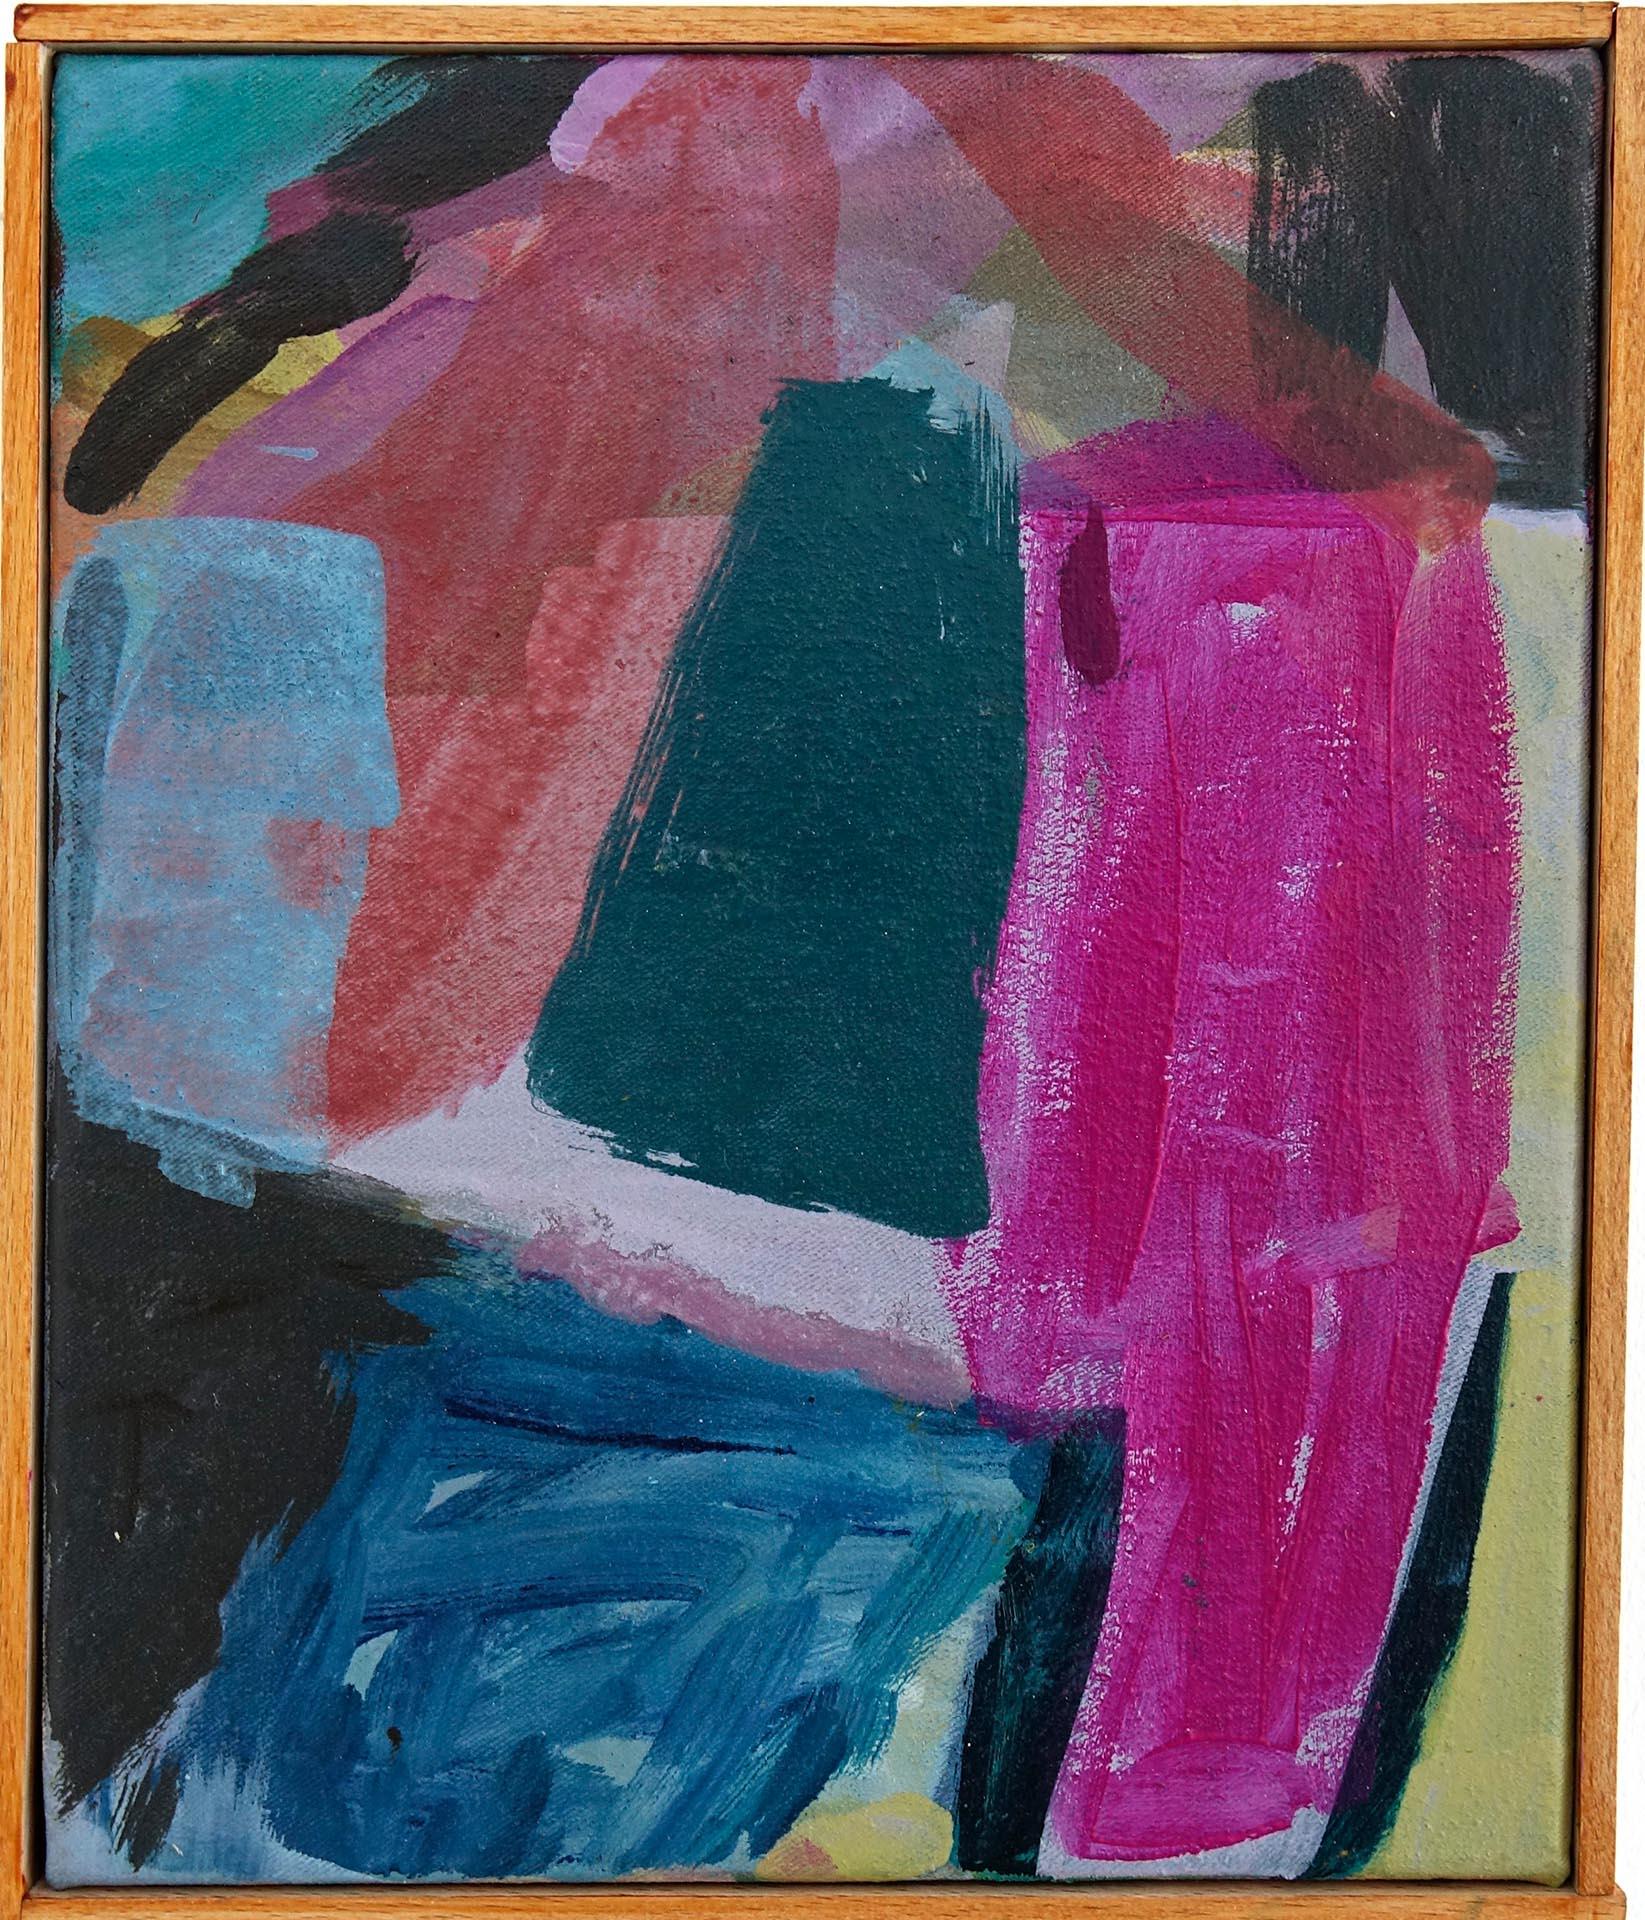 Violetta Ehnsperg | Patchwork Family | 27,2 x 23 cm | Galerie3